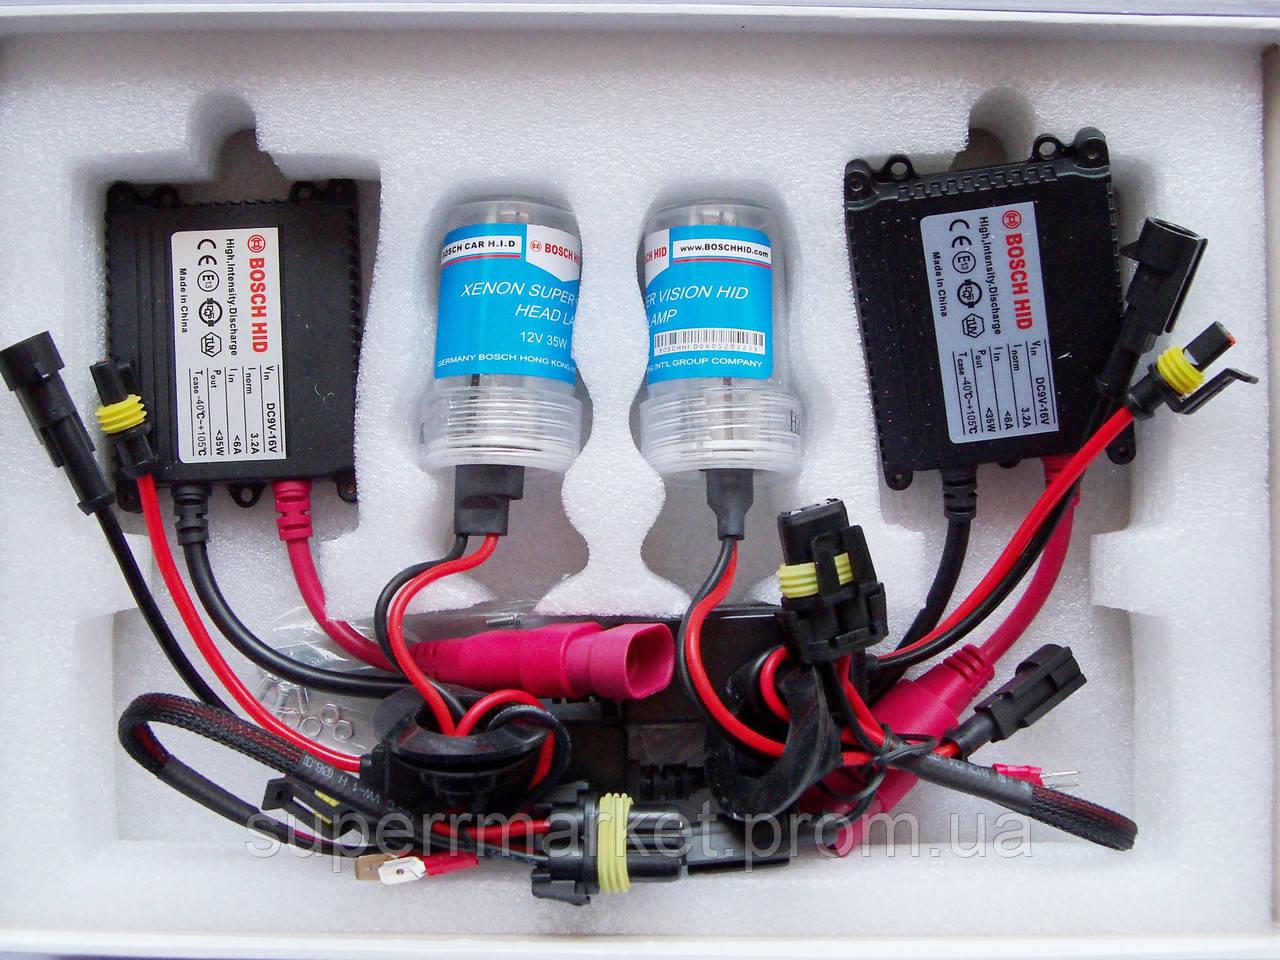 HID XENON H3  bosch  5000K 12V 35W - комплект ксеноновых ламп для автомобиля